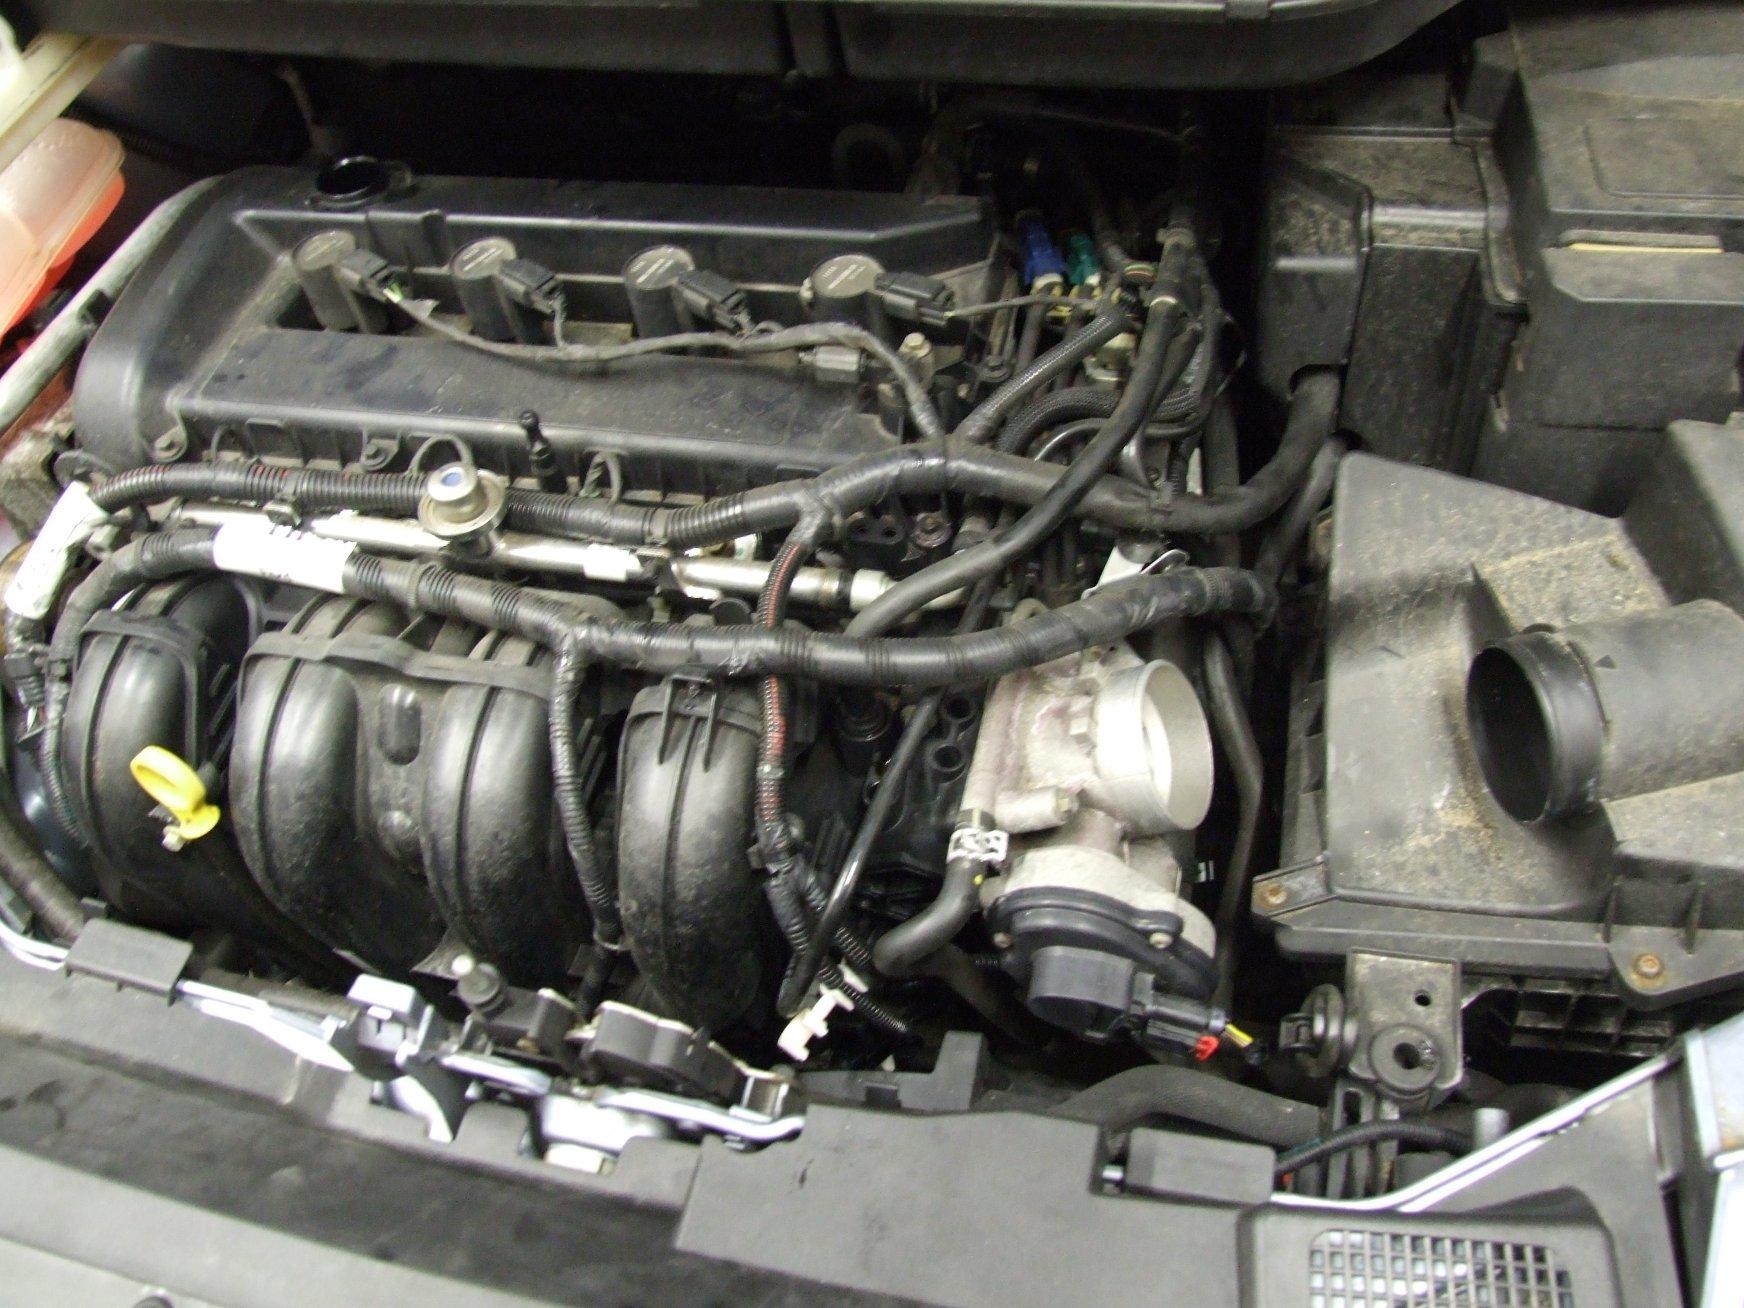 Ford Focus C-MAX road tests and car reviews